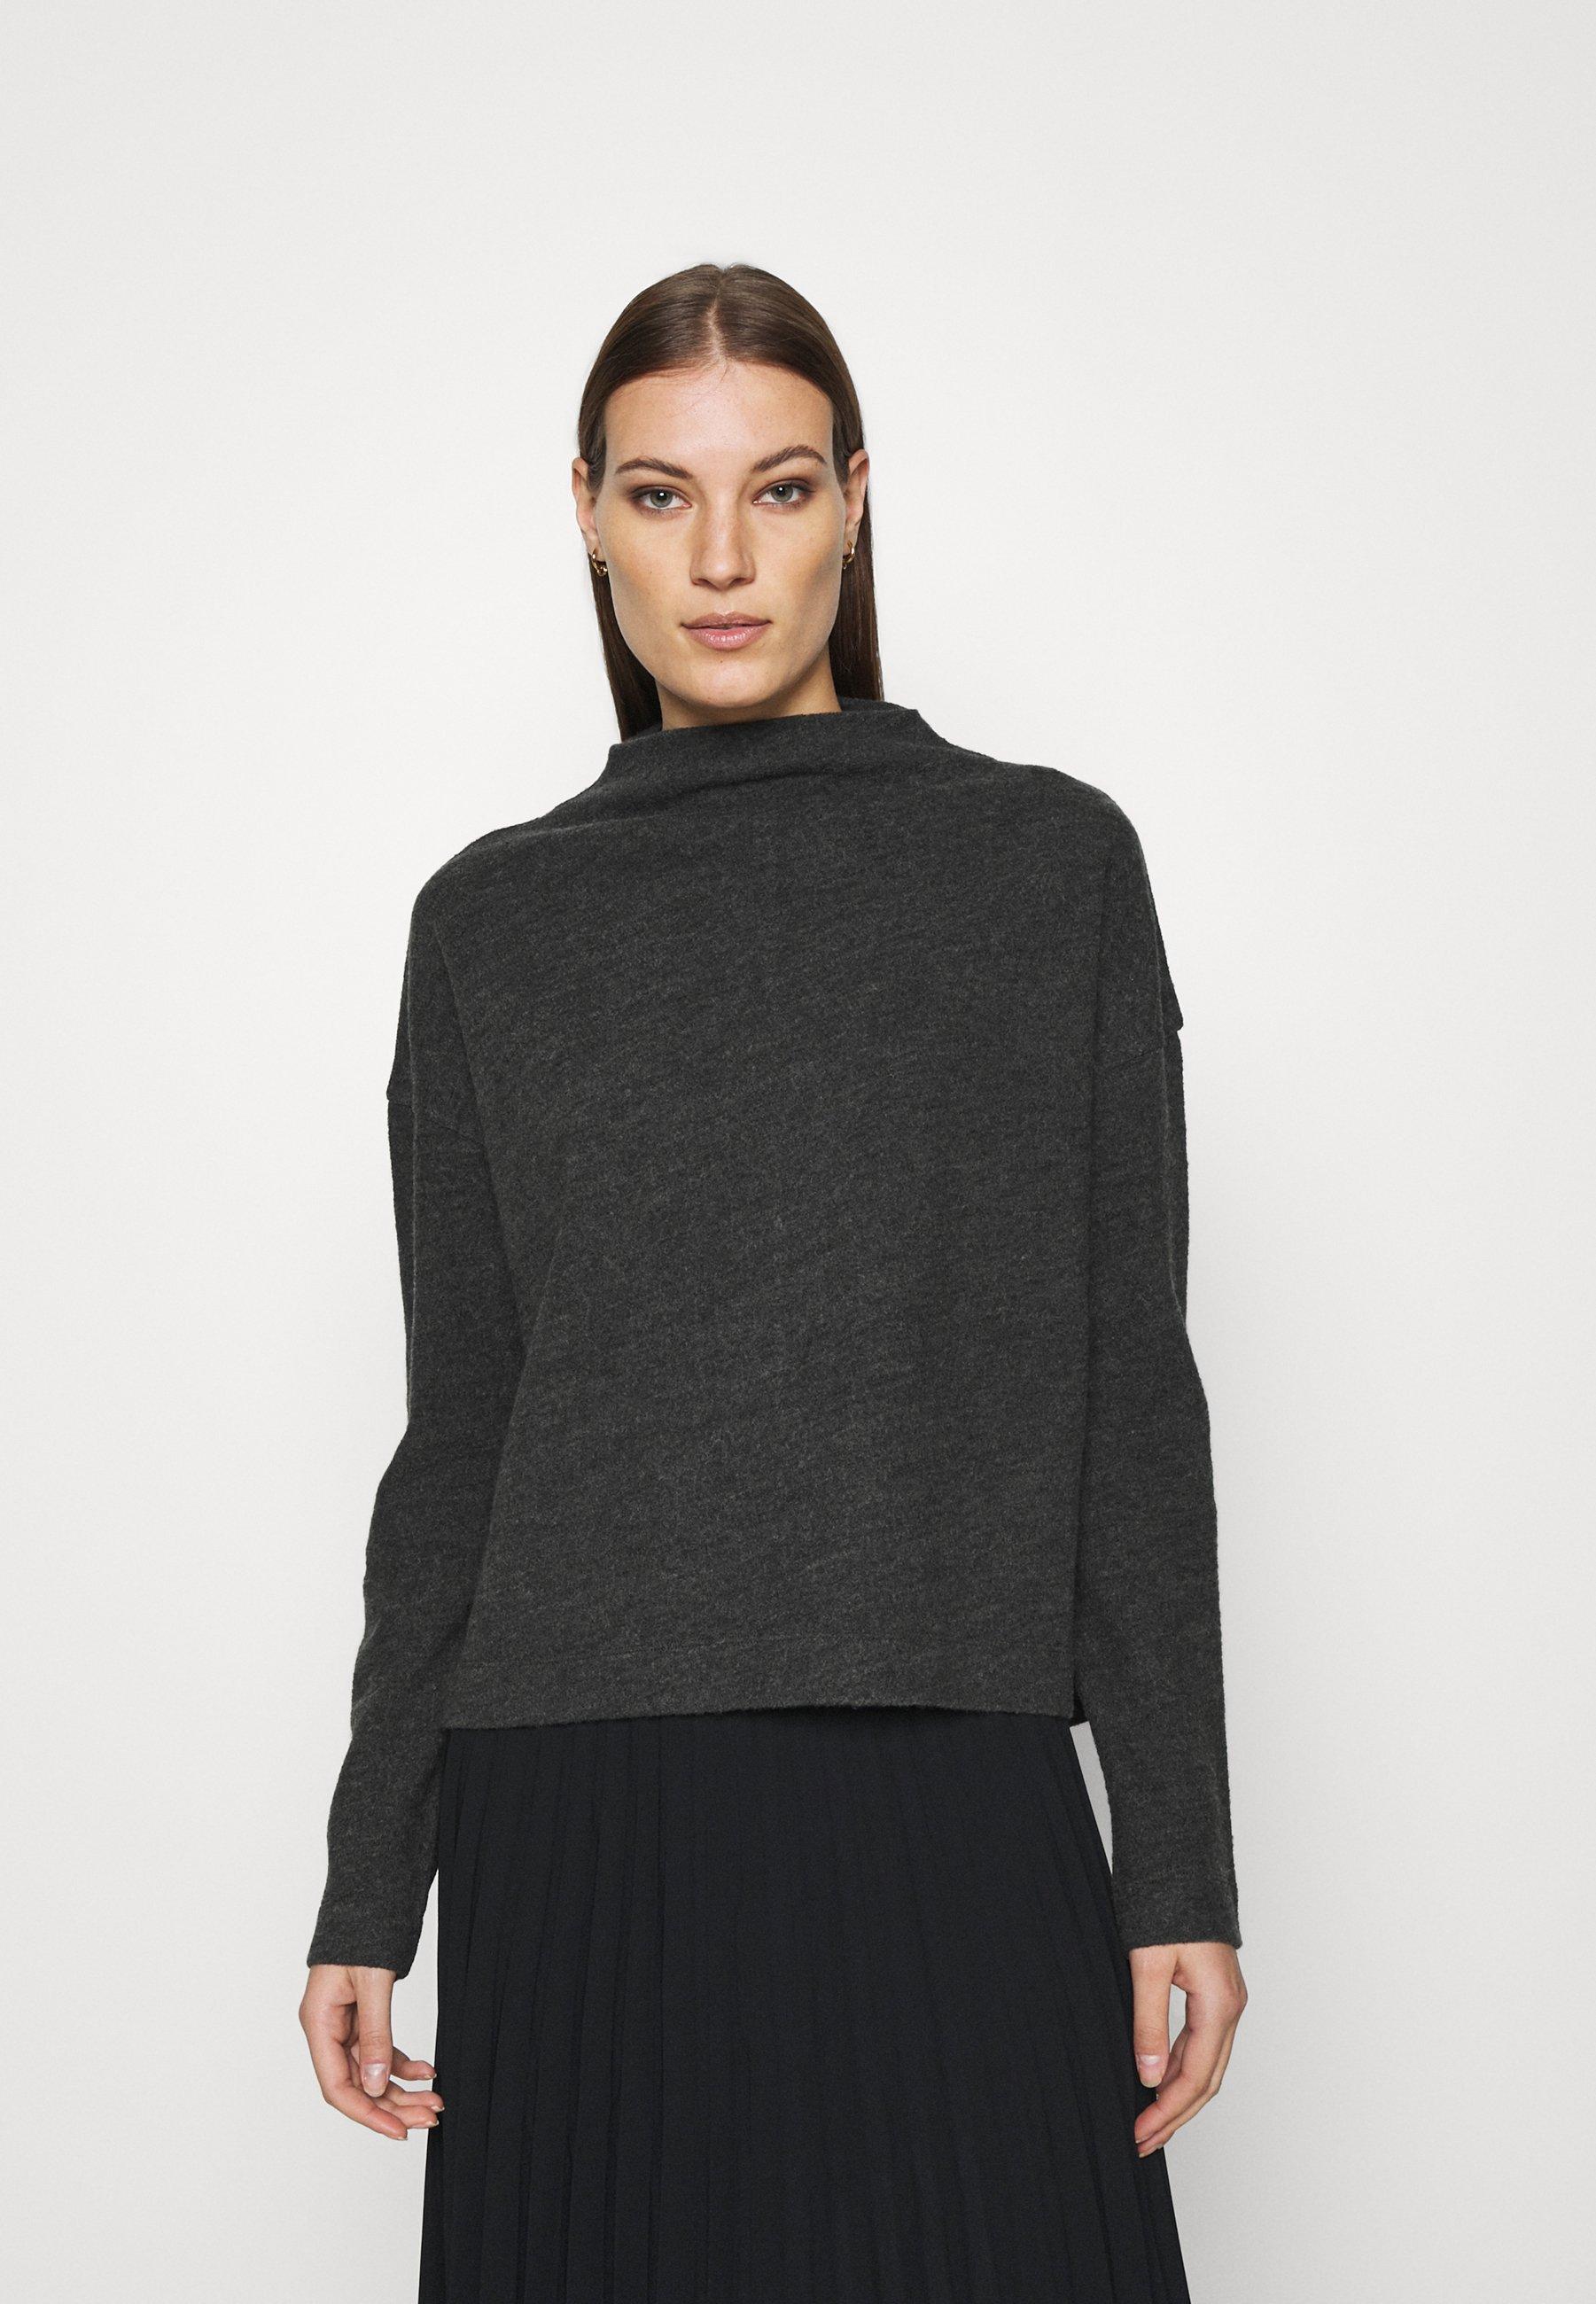 Femme KNIT - TURTLENECK - Pullover - grey dark